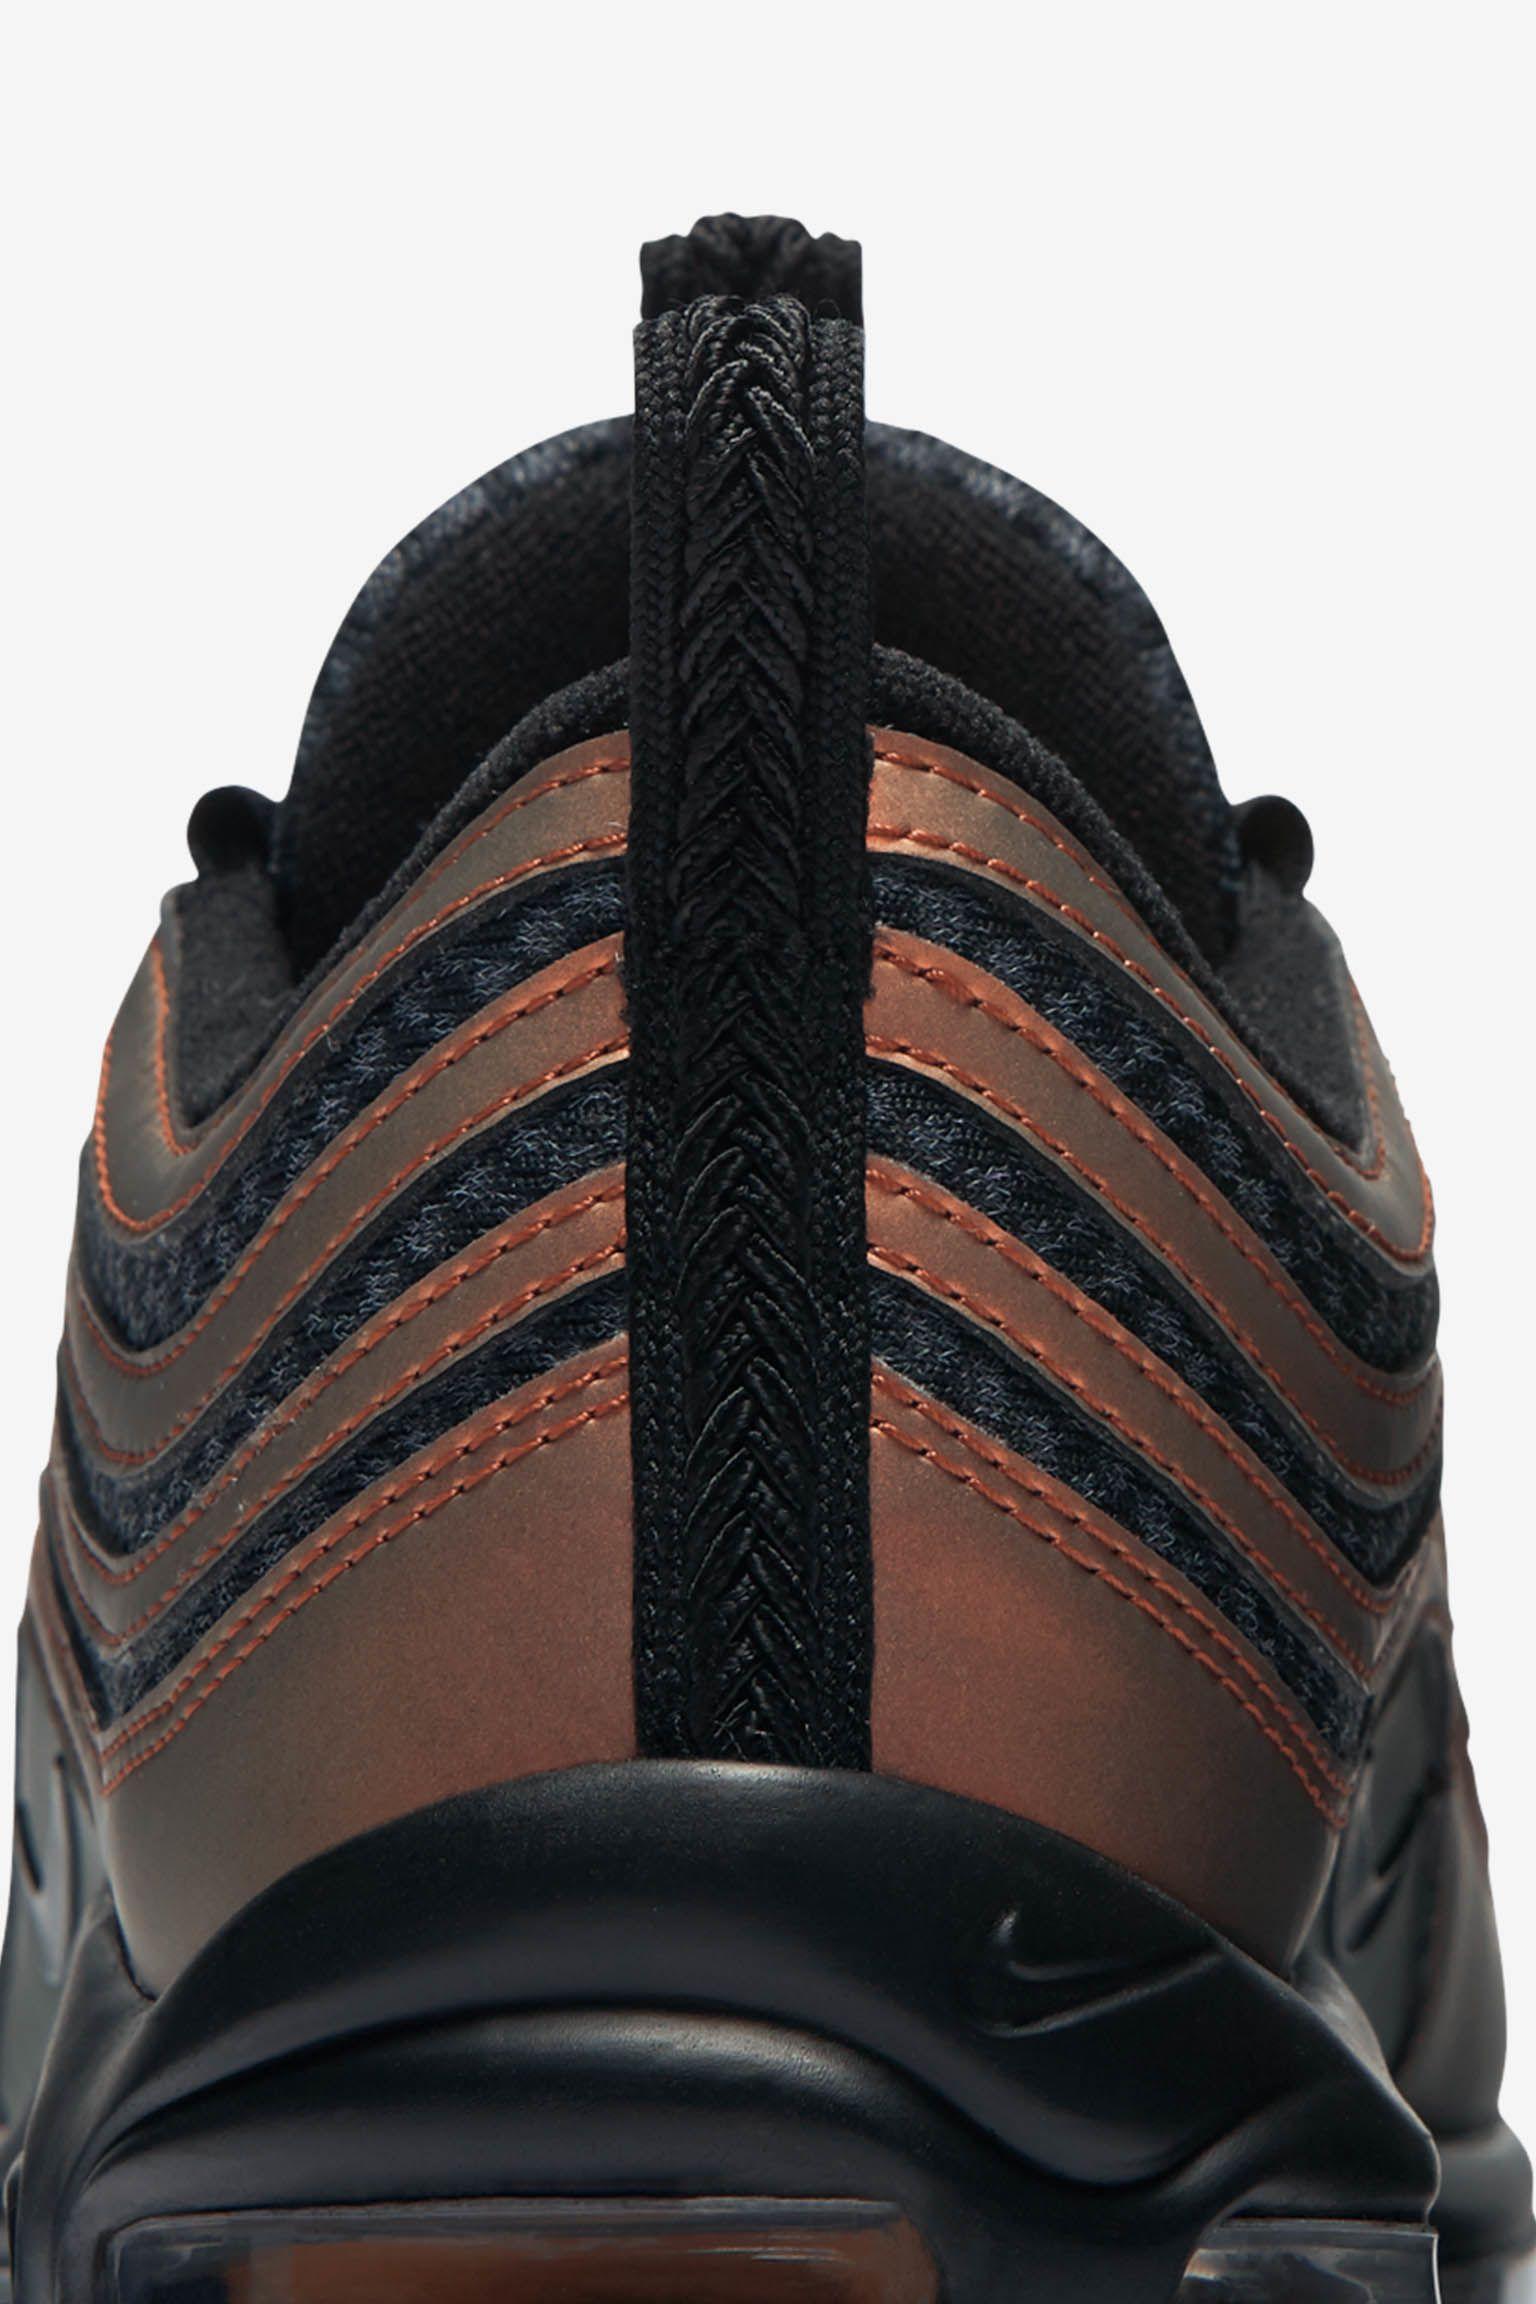 Nike Air Max 97 Ultra '17 Skepta Release Date. Nike SNKRS